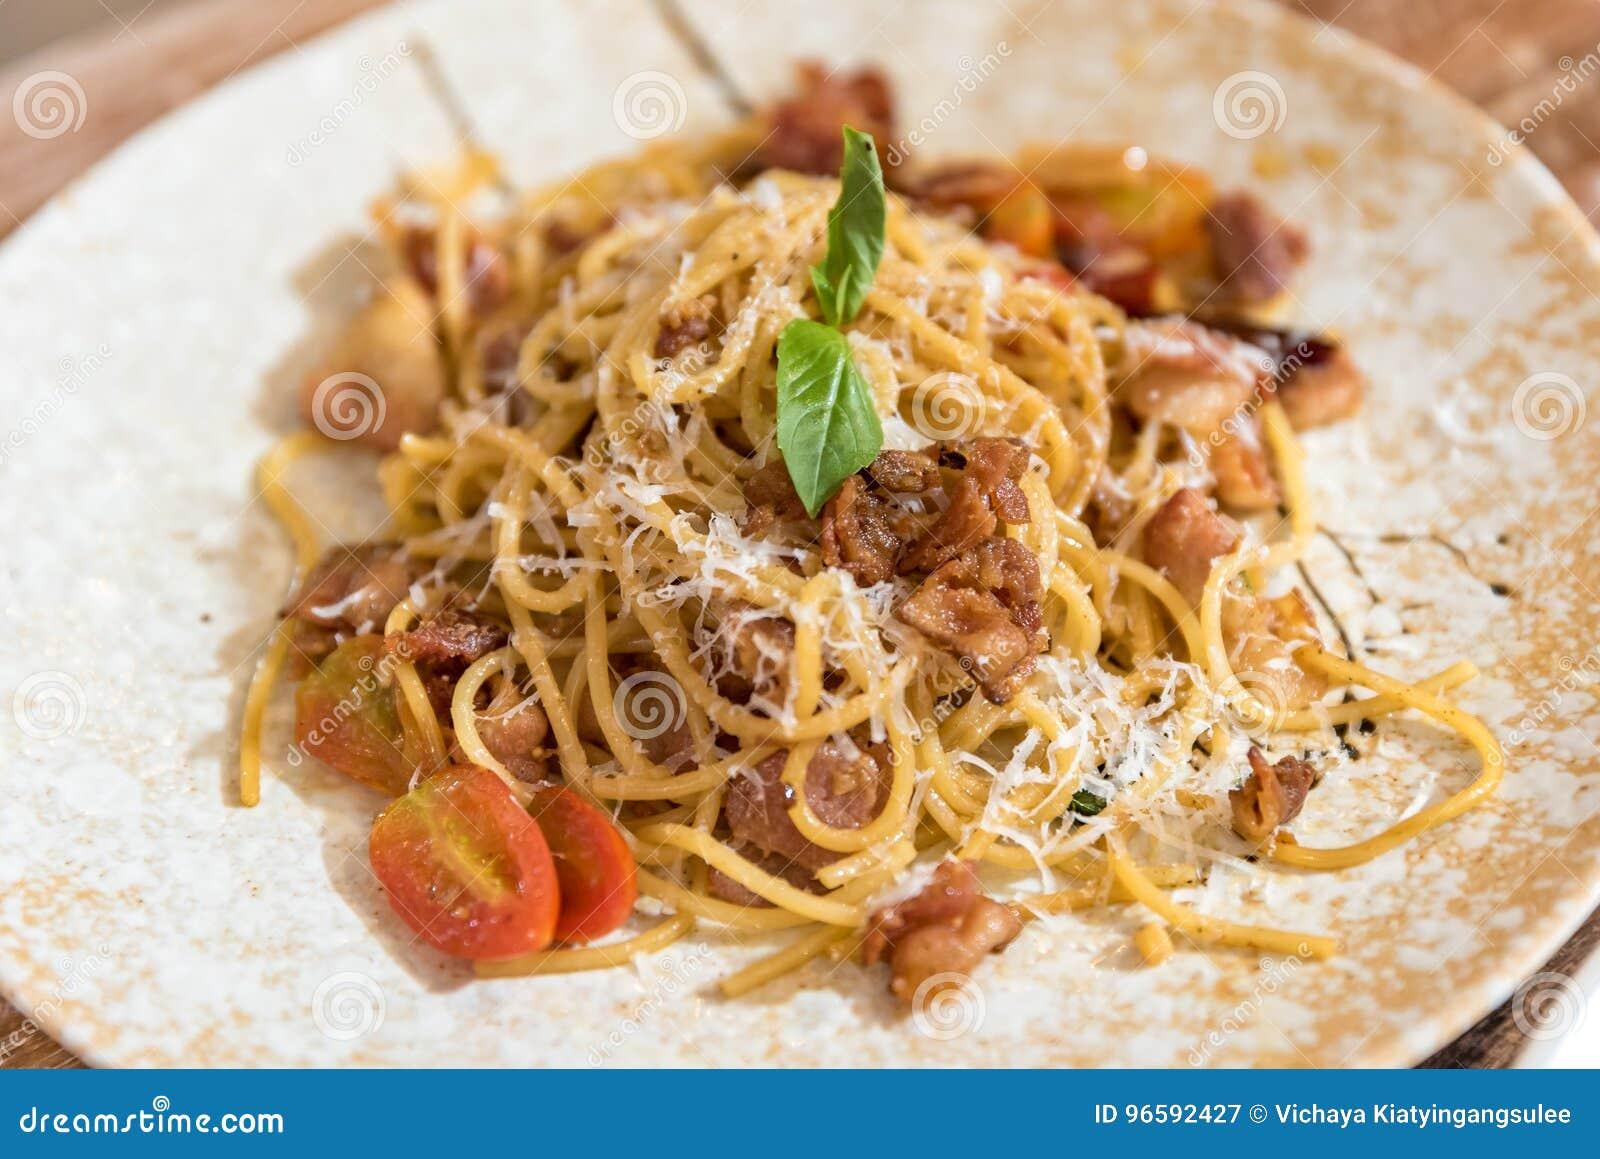 Carbonara日光拍的意大利面食照片